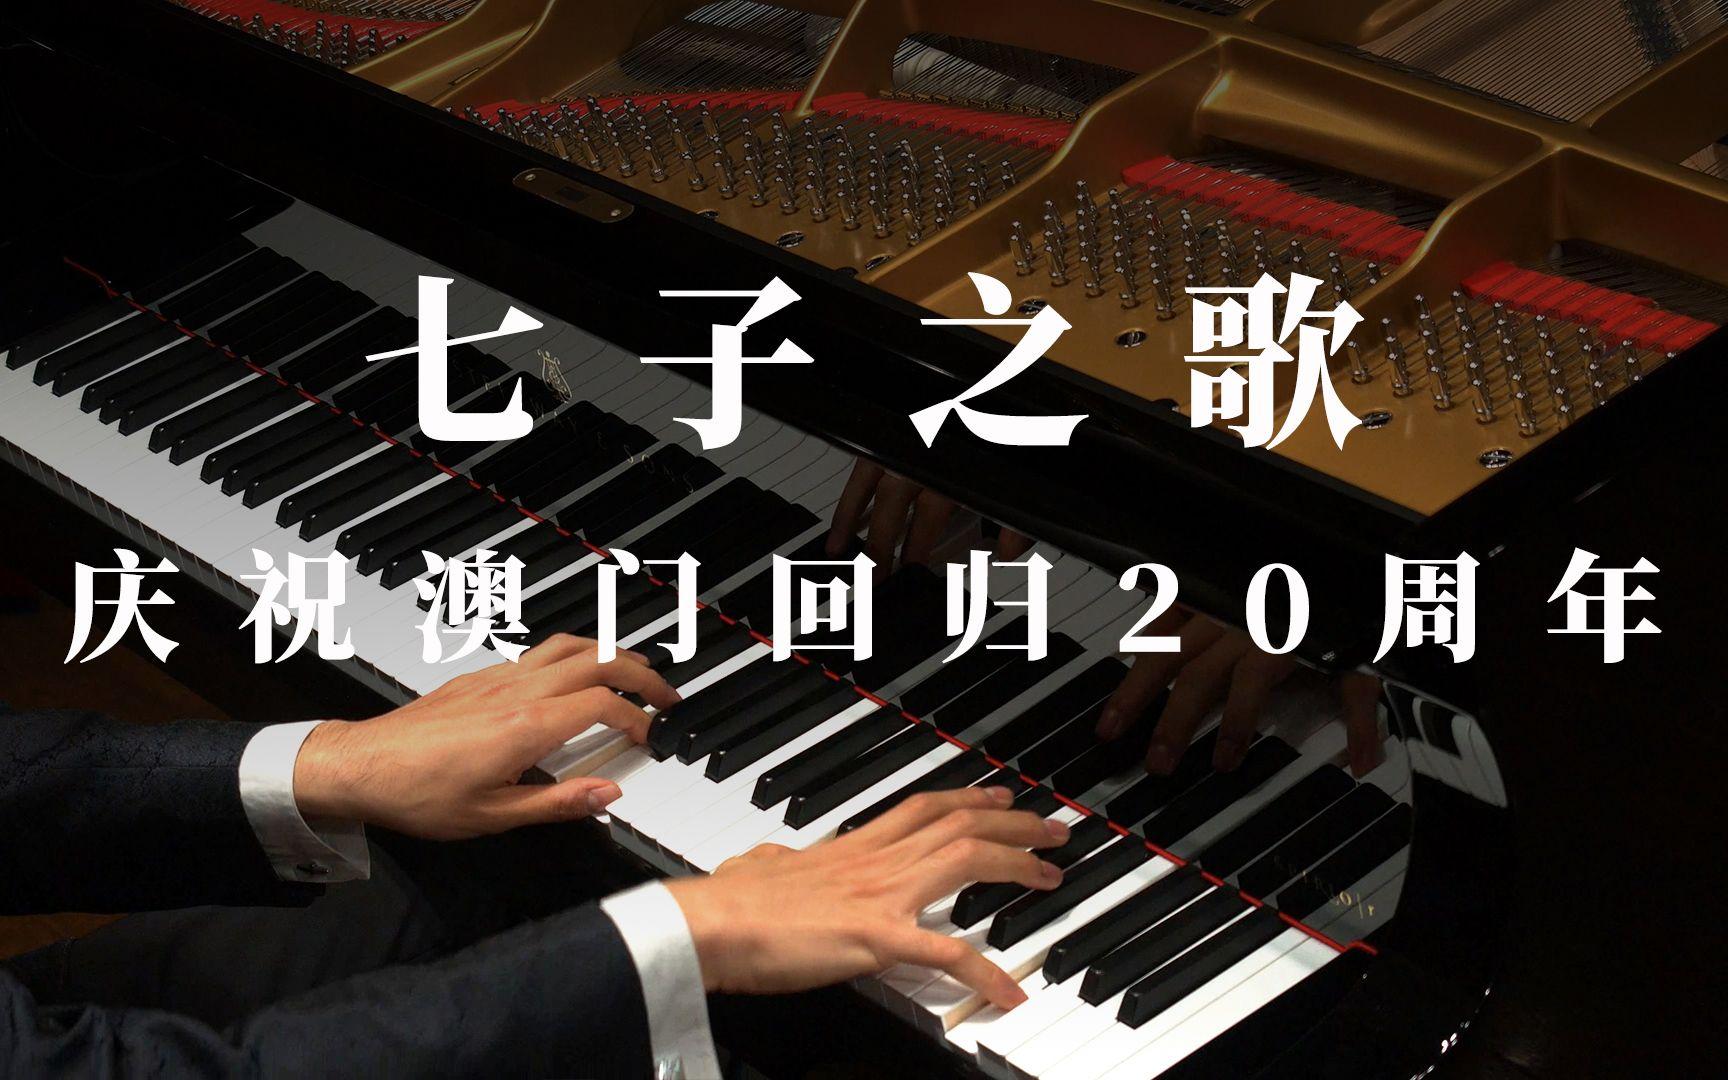 七子之歌 庆祝澳门回归20周年 Animenz 钢琴改编_哔哩哔哩 (゜-゜)つロ 干杯~-bilibili